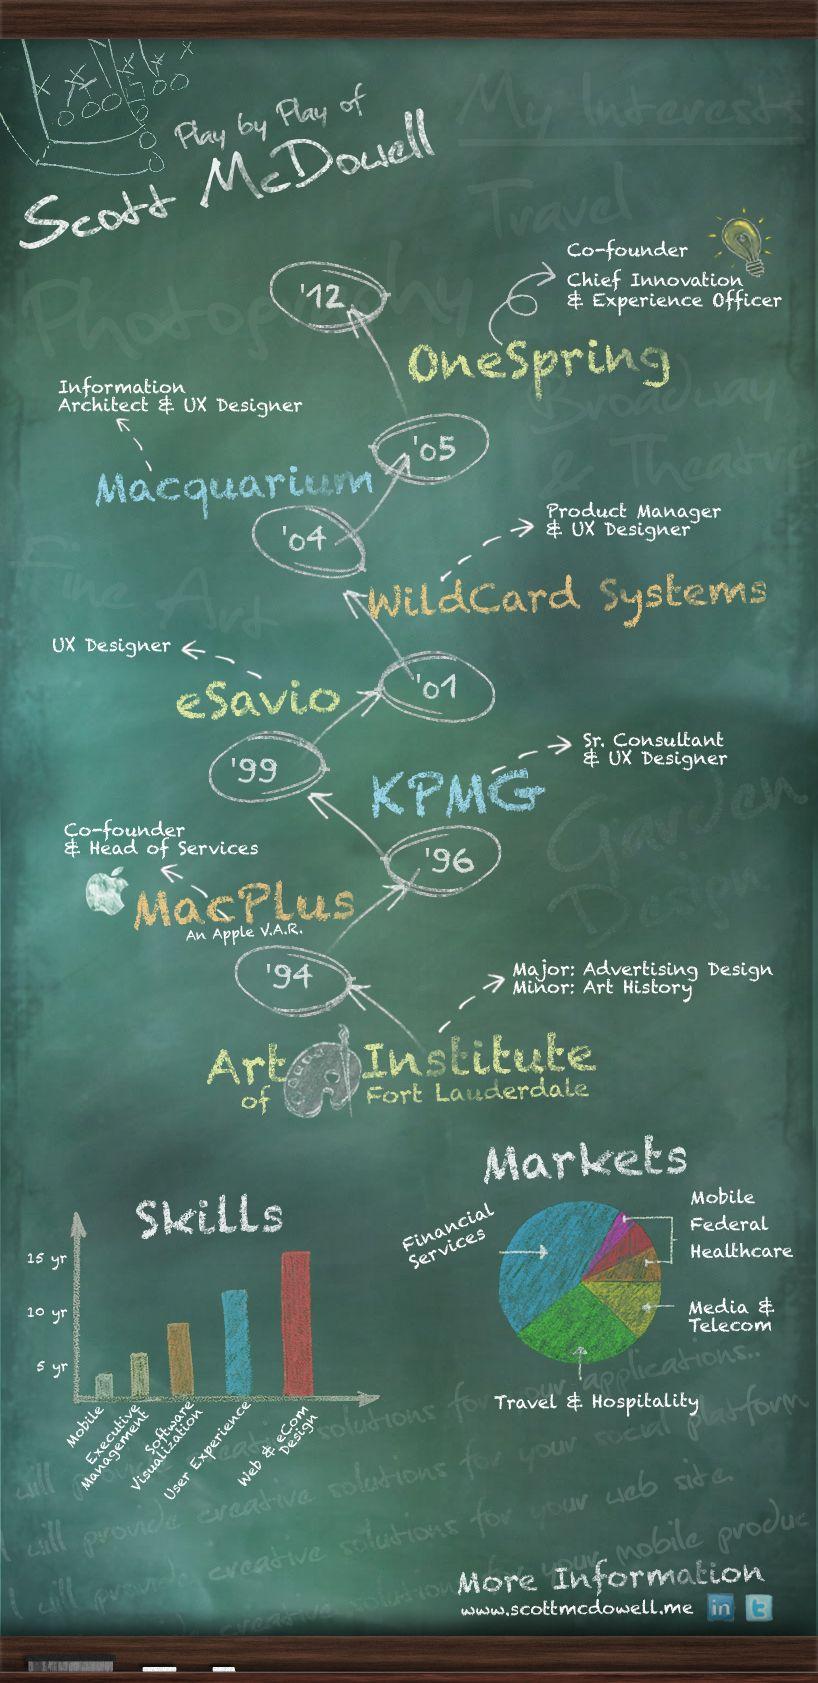 Resume Designs | Infographics | Pinterest | Infographic, Infographic ...